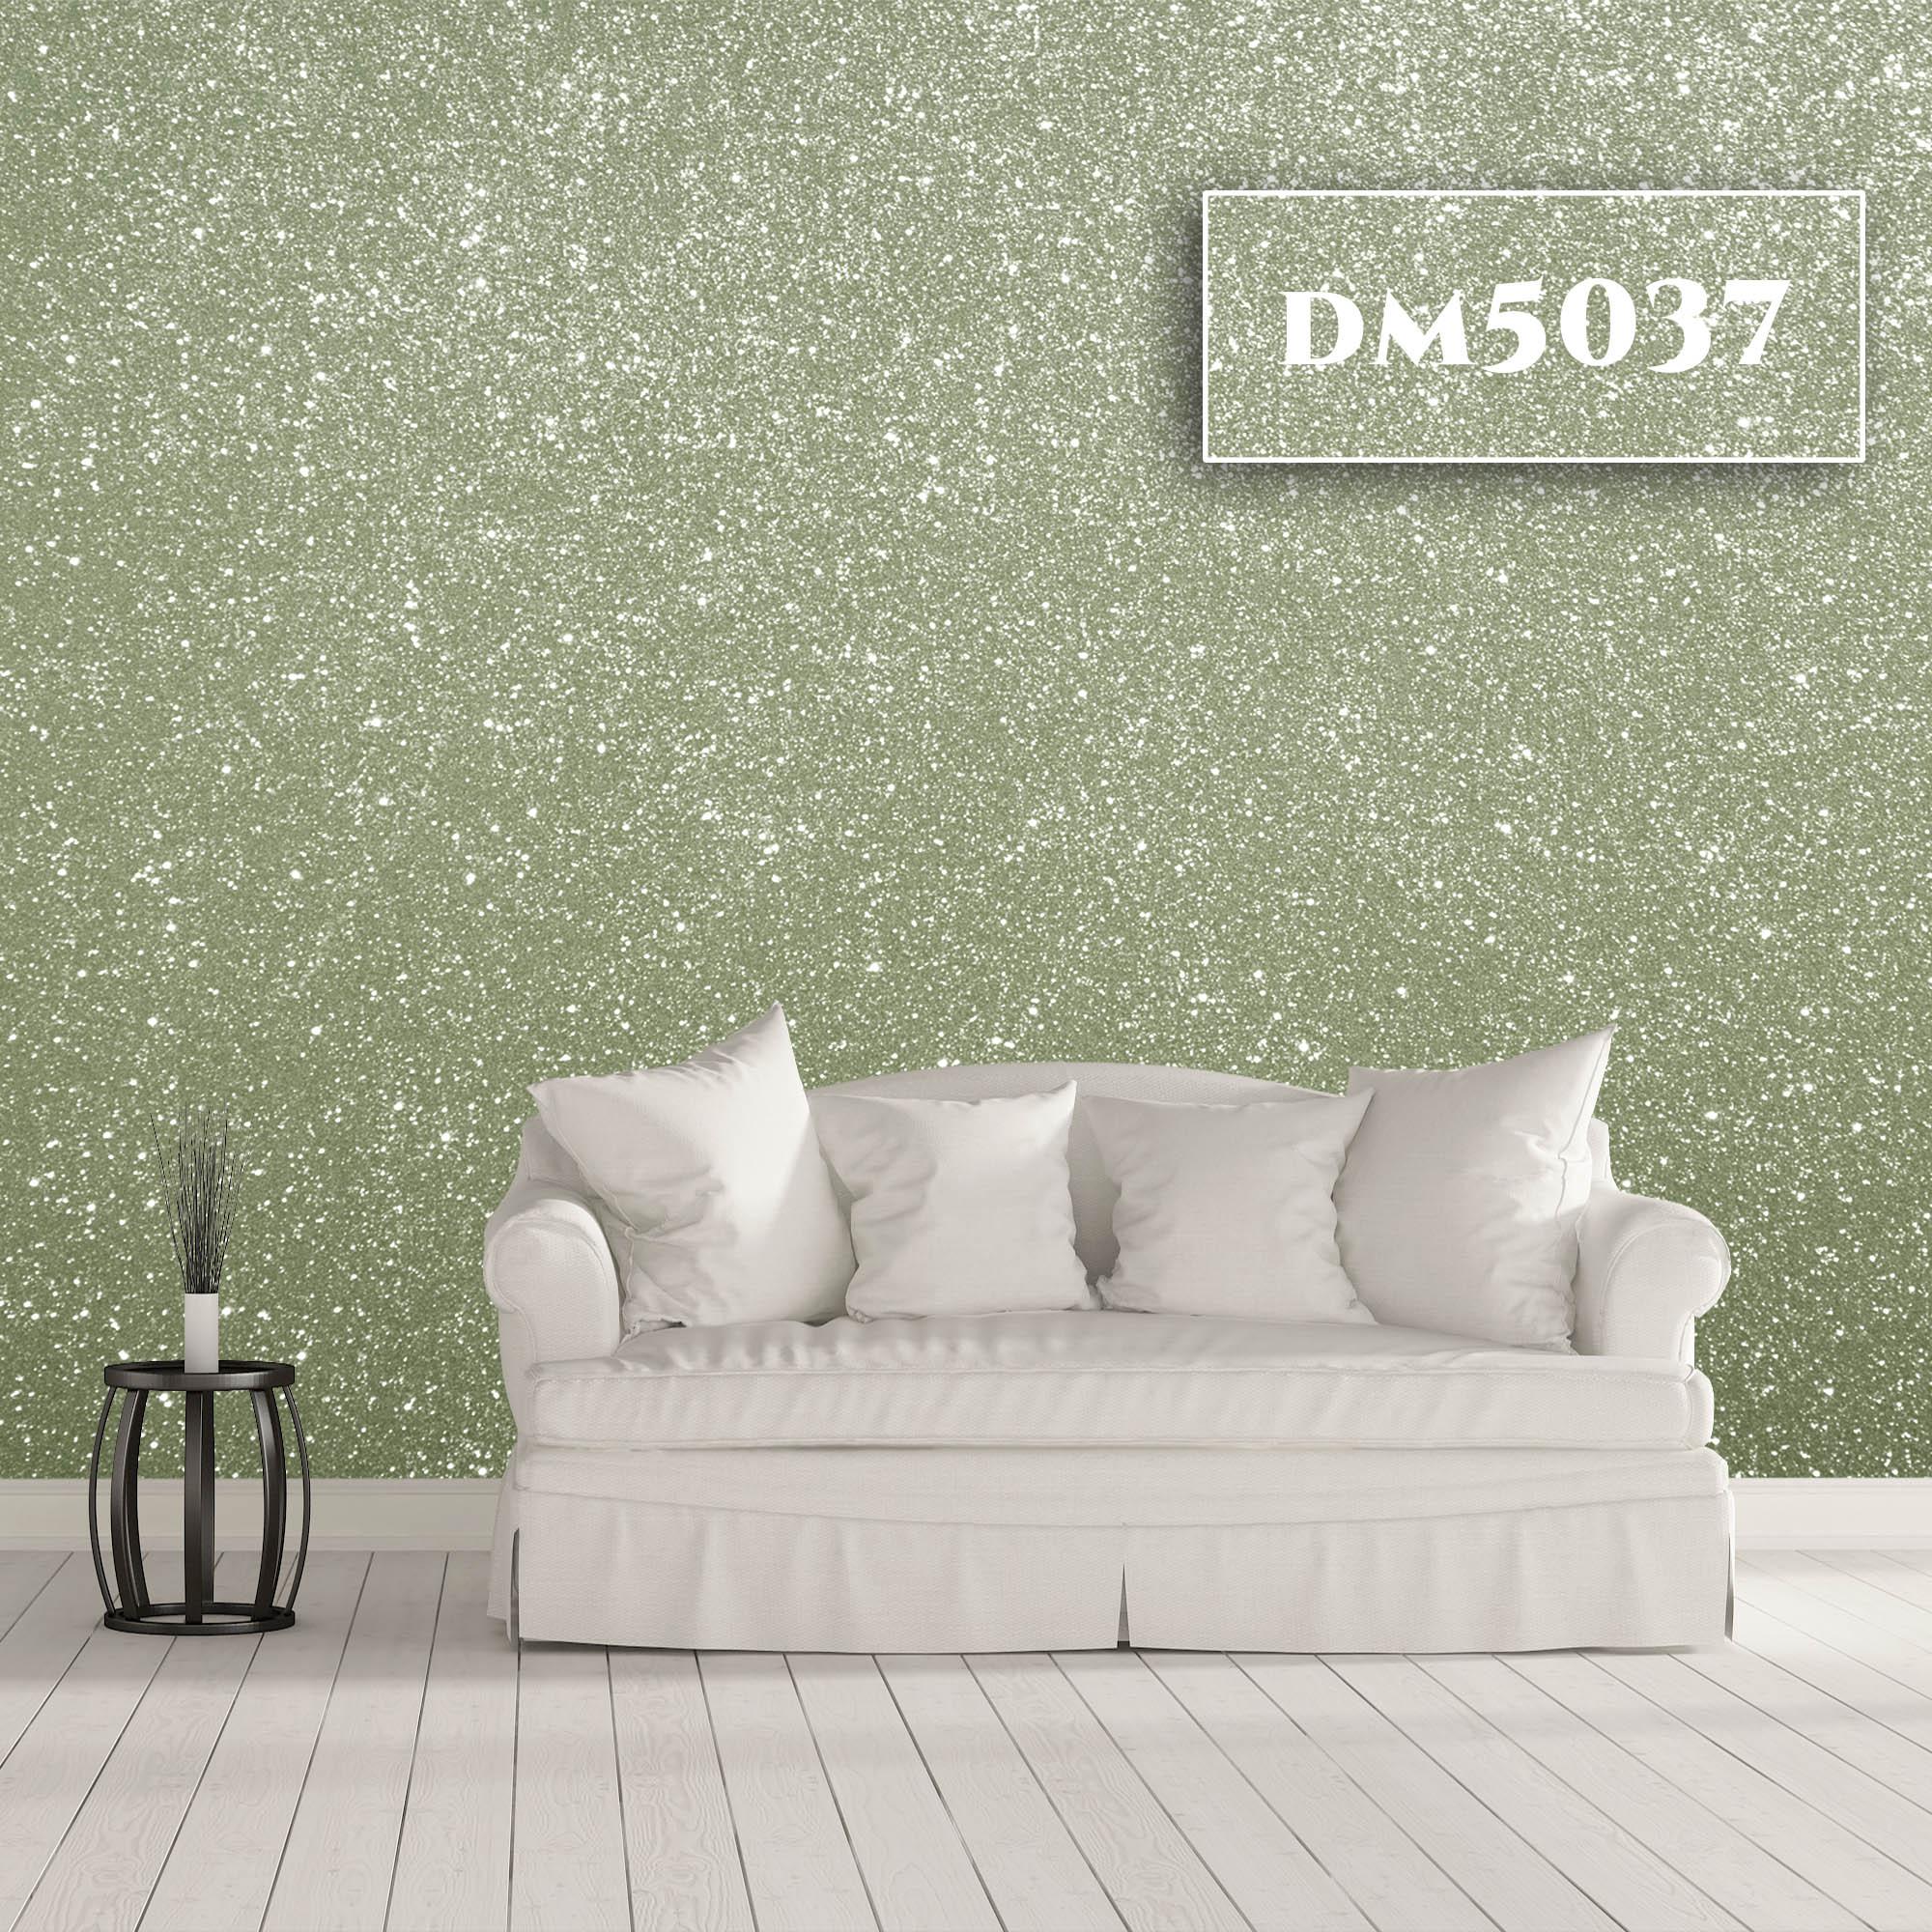 DM5037